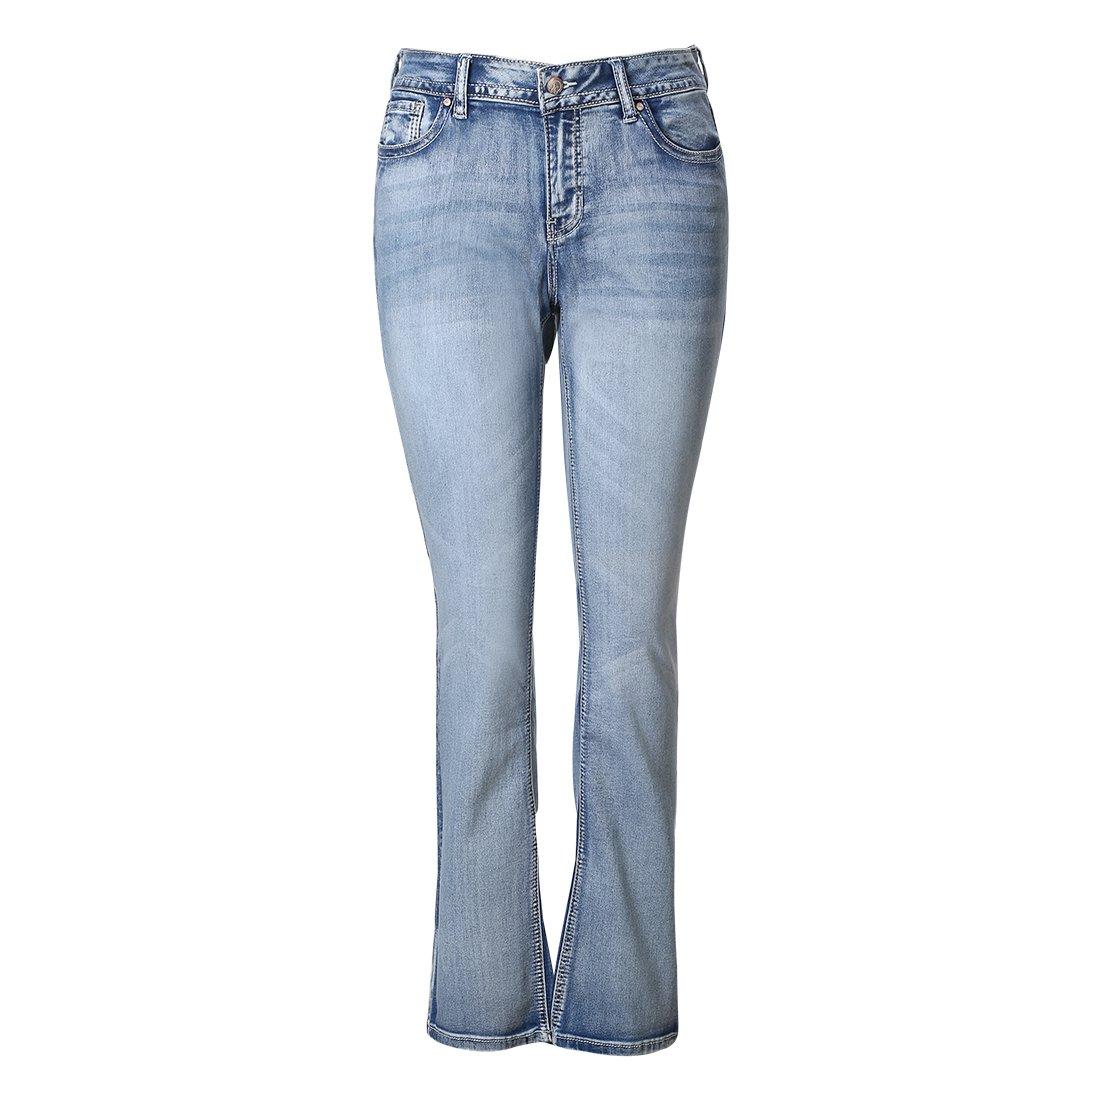 MSSHE Women's Plus Size Vintage Stretchy Jeans,05-inseam-32.0'',20W(Waist 39-40'' Hip 46-47'')